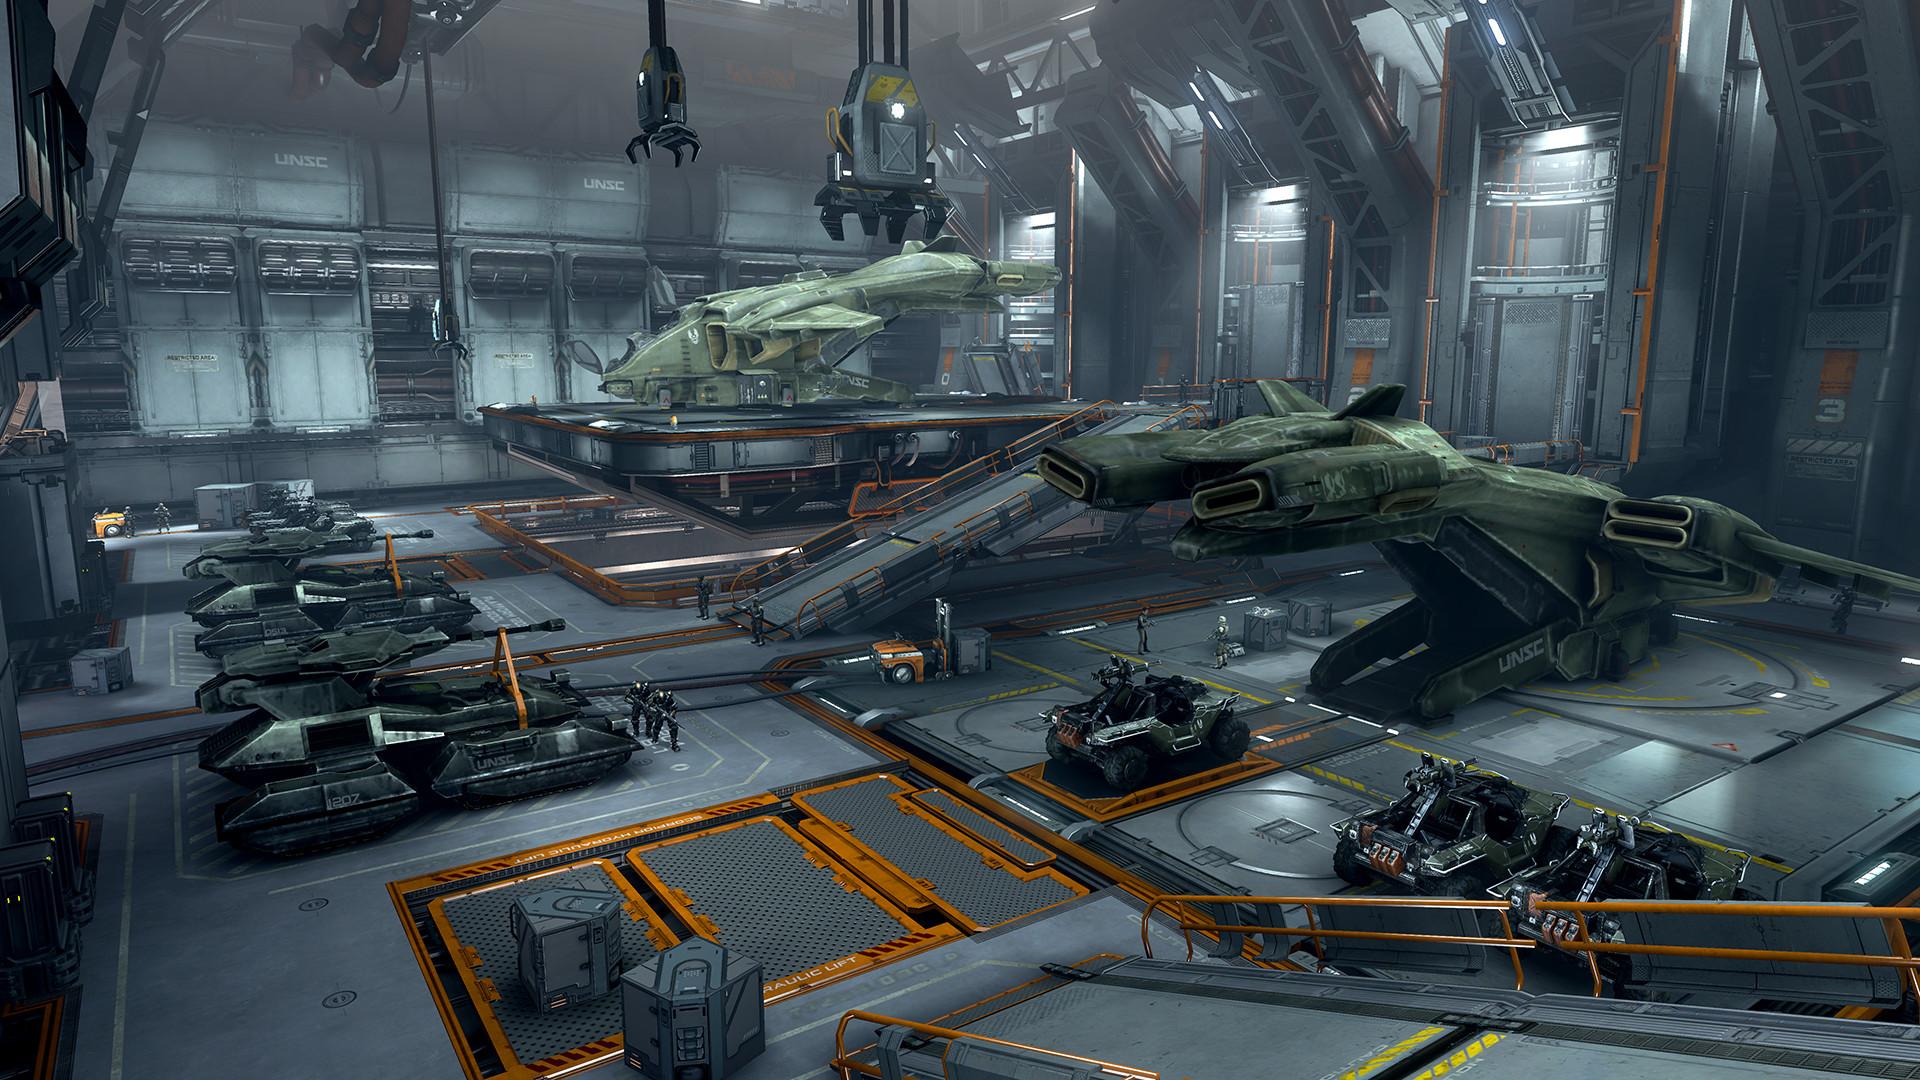 The Stellaris mobile game remains offline as Paradox investigates stolen art assets | PC Gamer